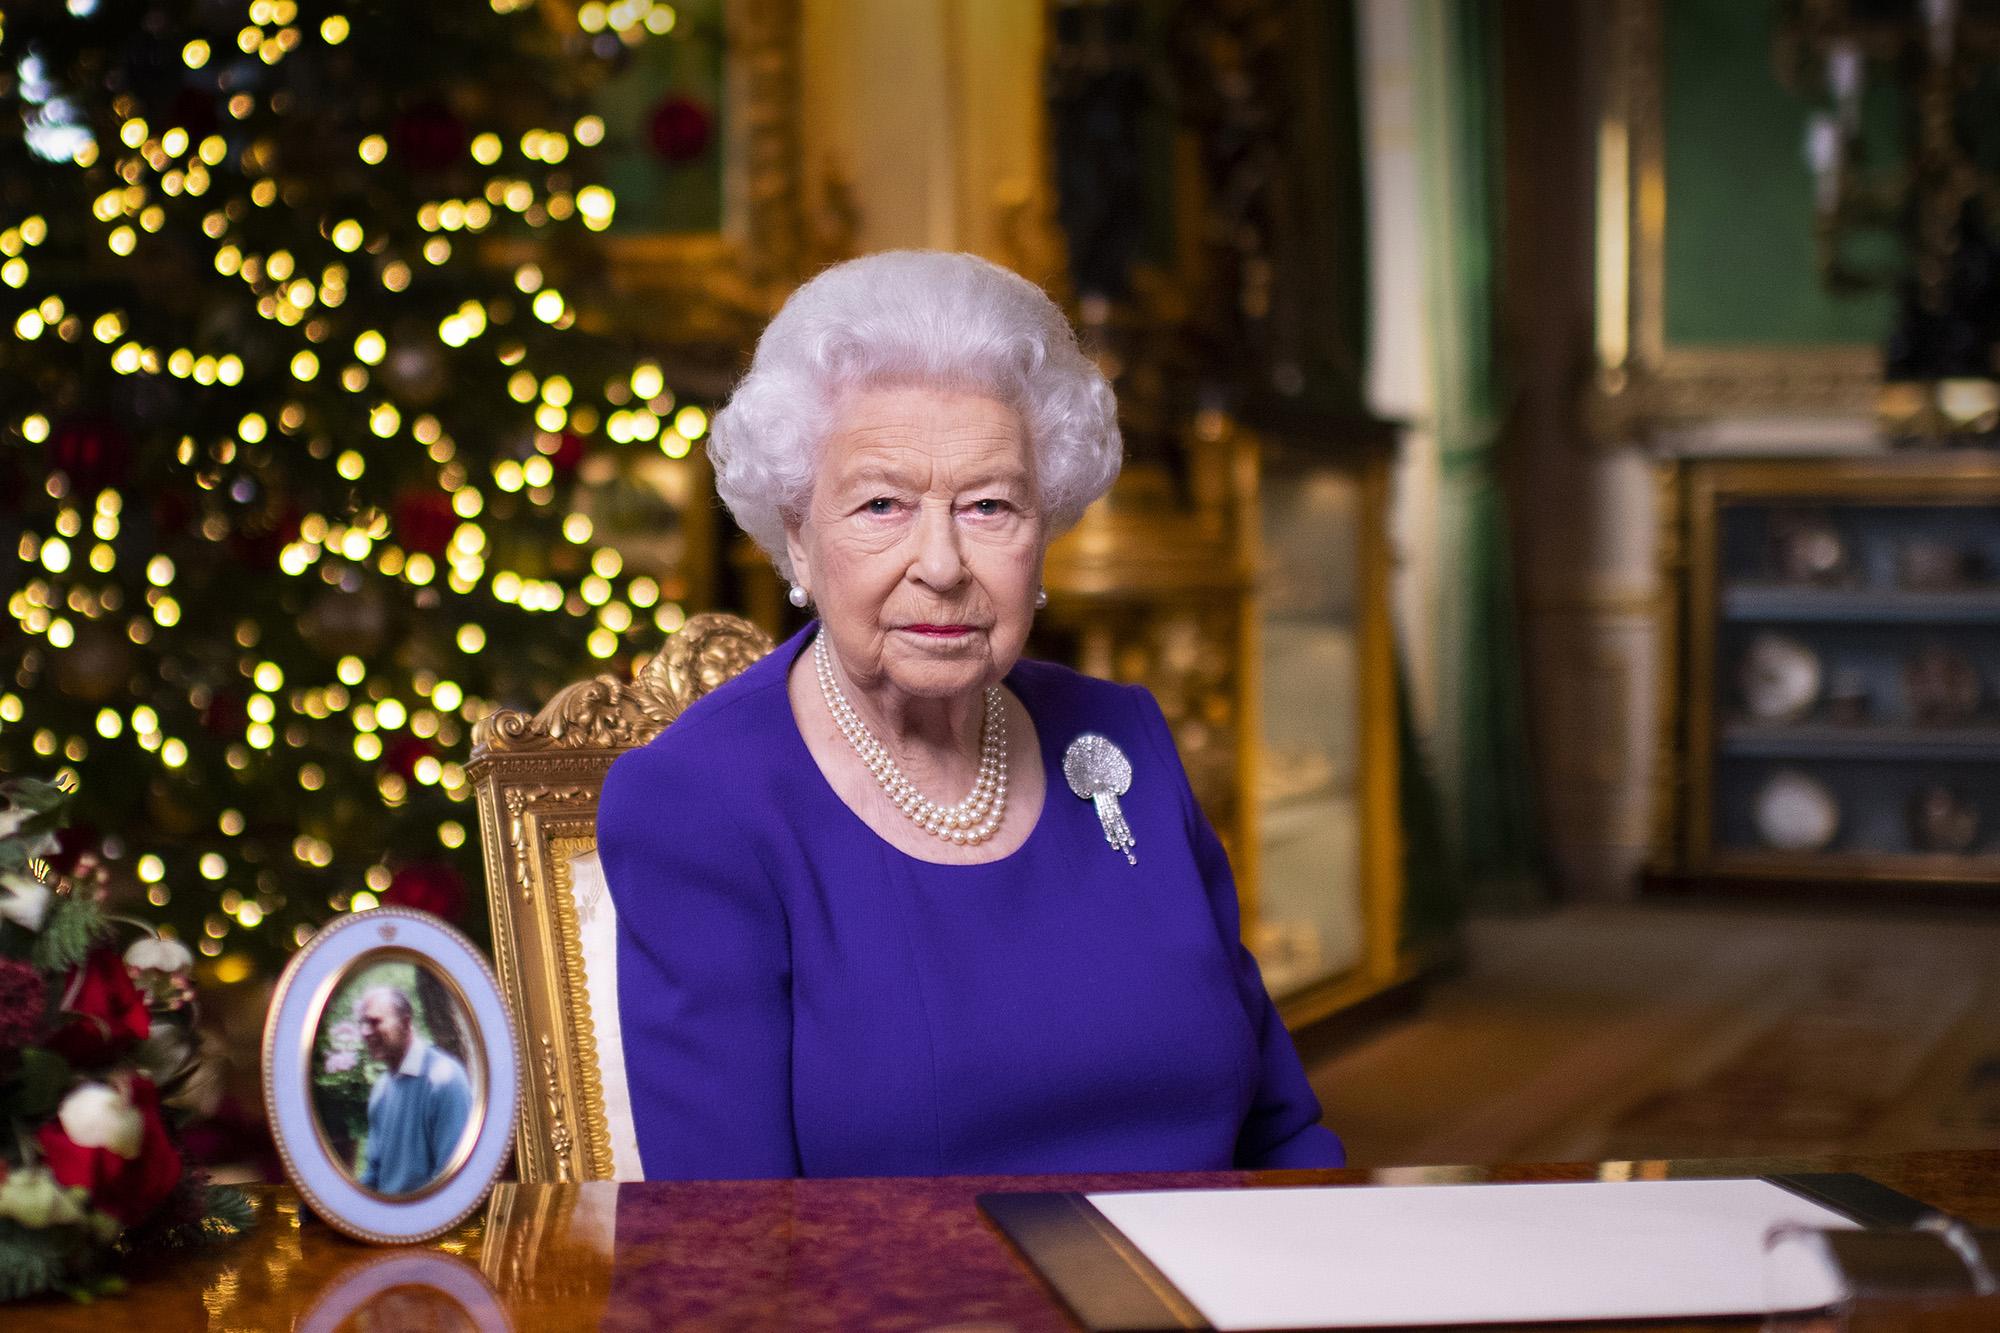 'Deepfake' Queen Elizabeth II warns about misinformation